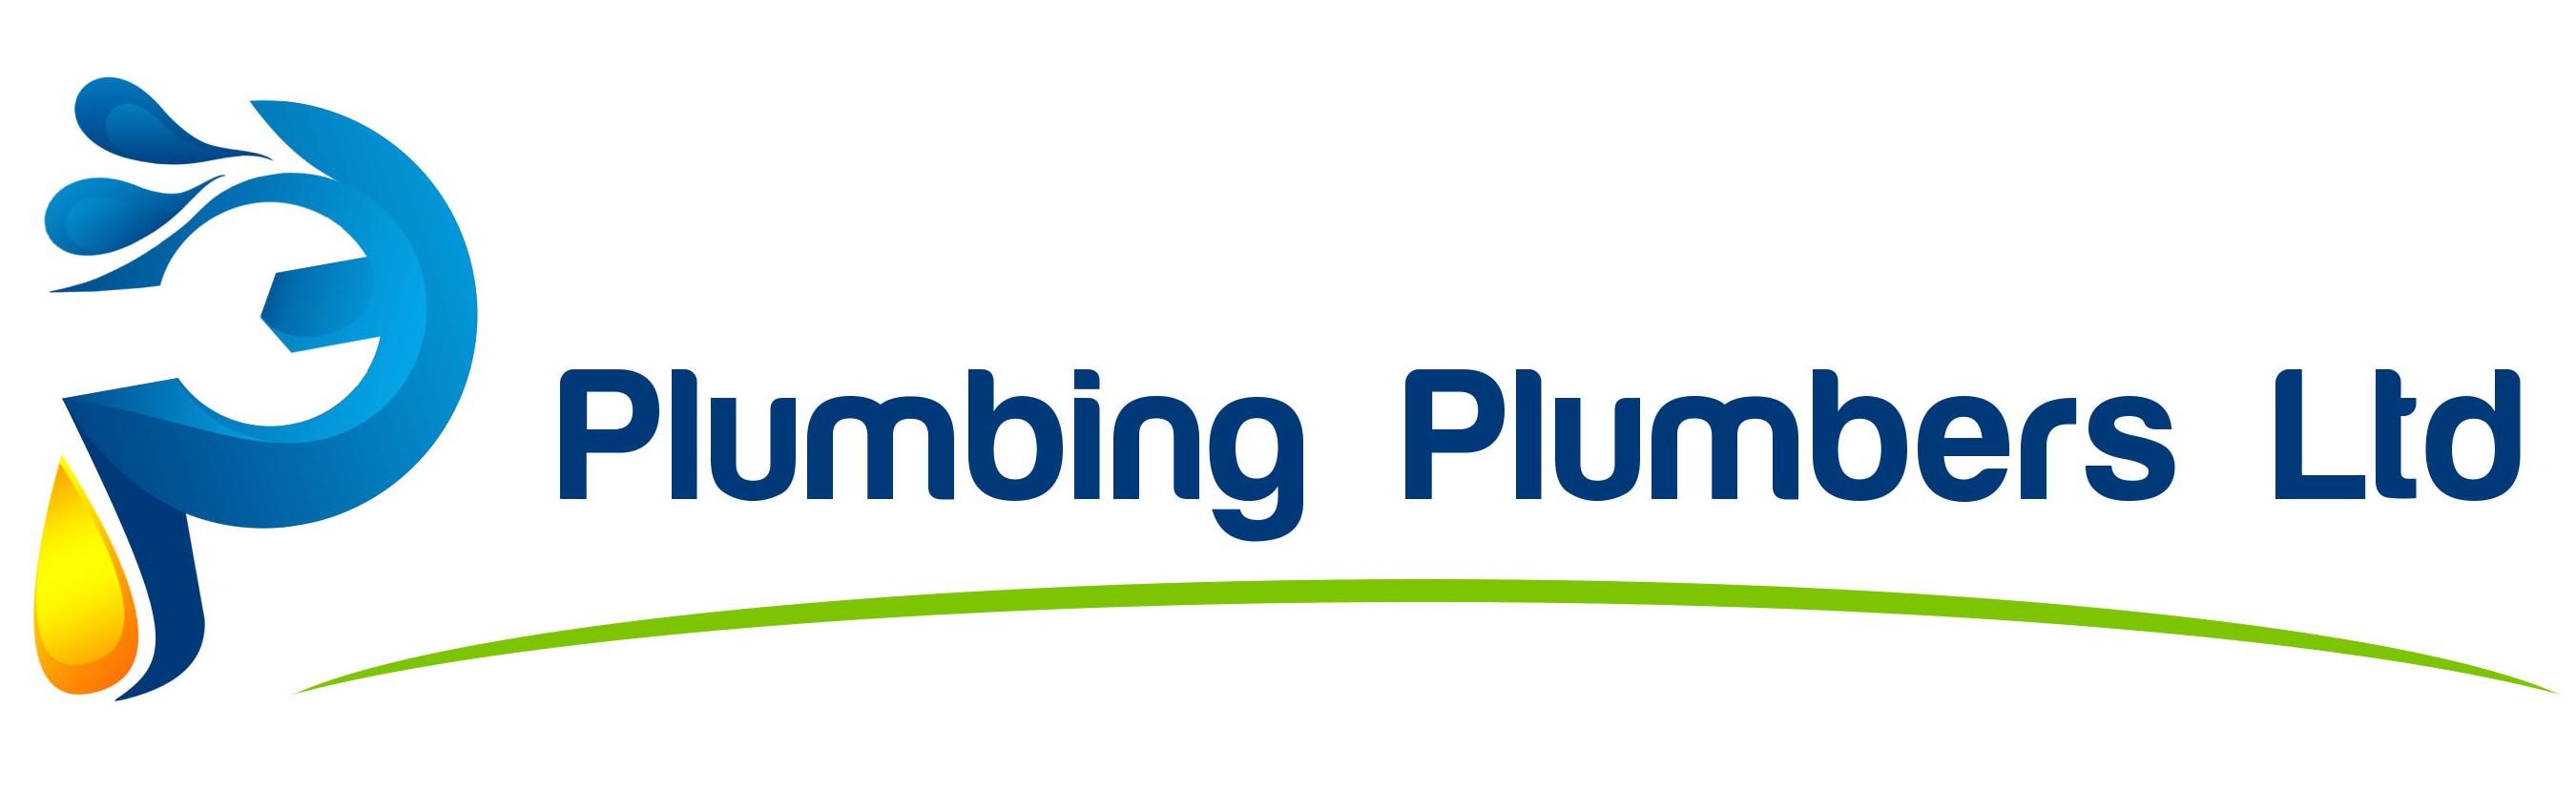 Plumbing Plumbers Ltd Verified Logo